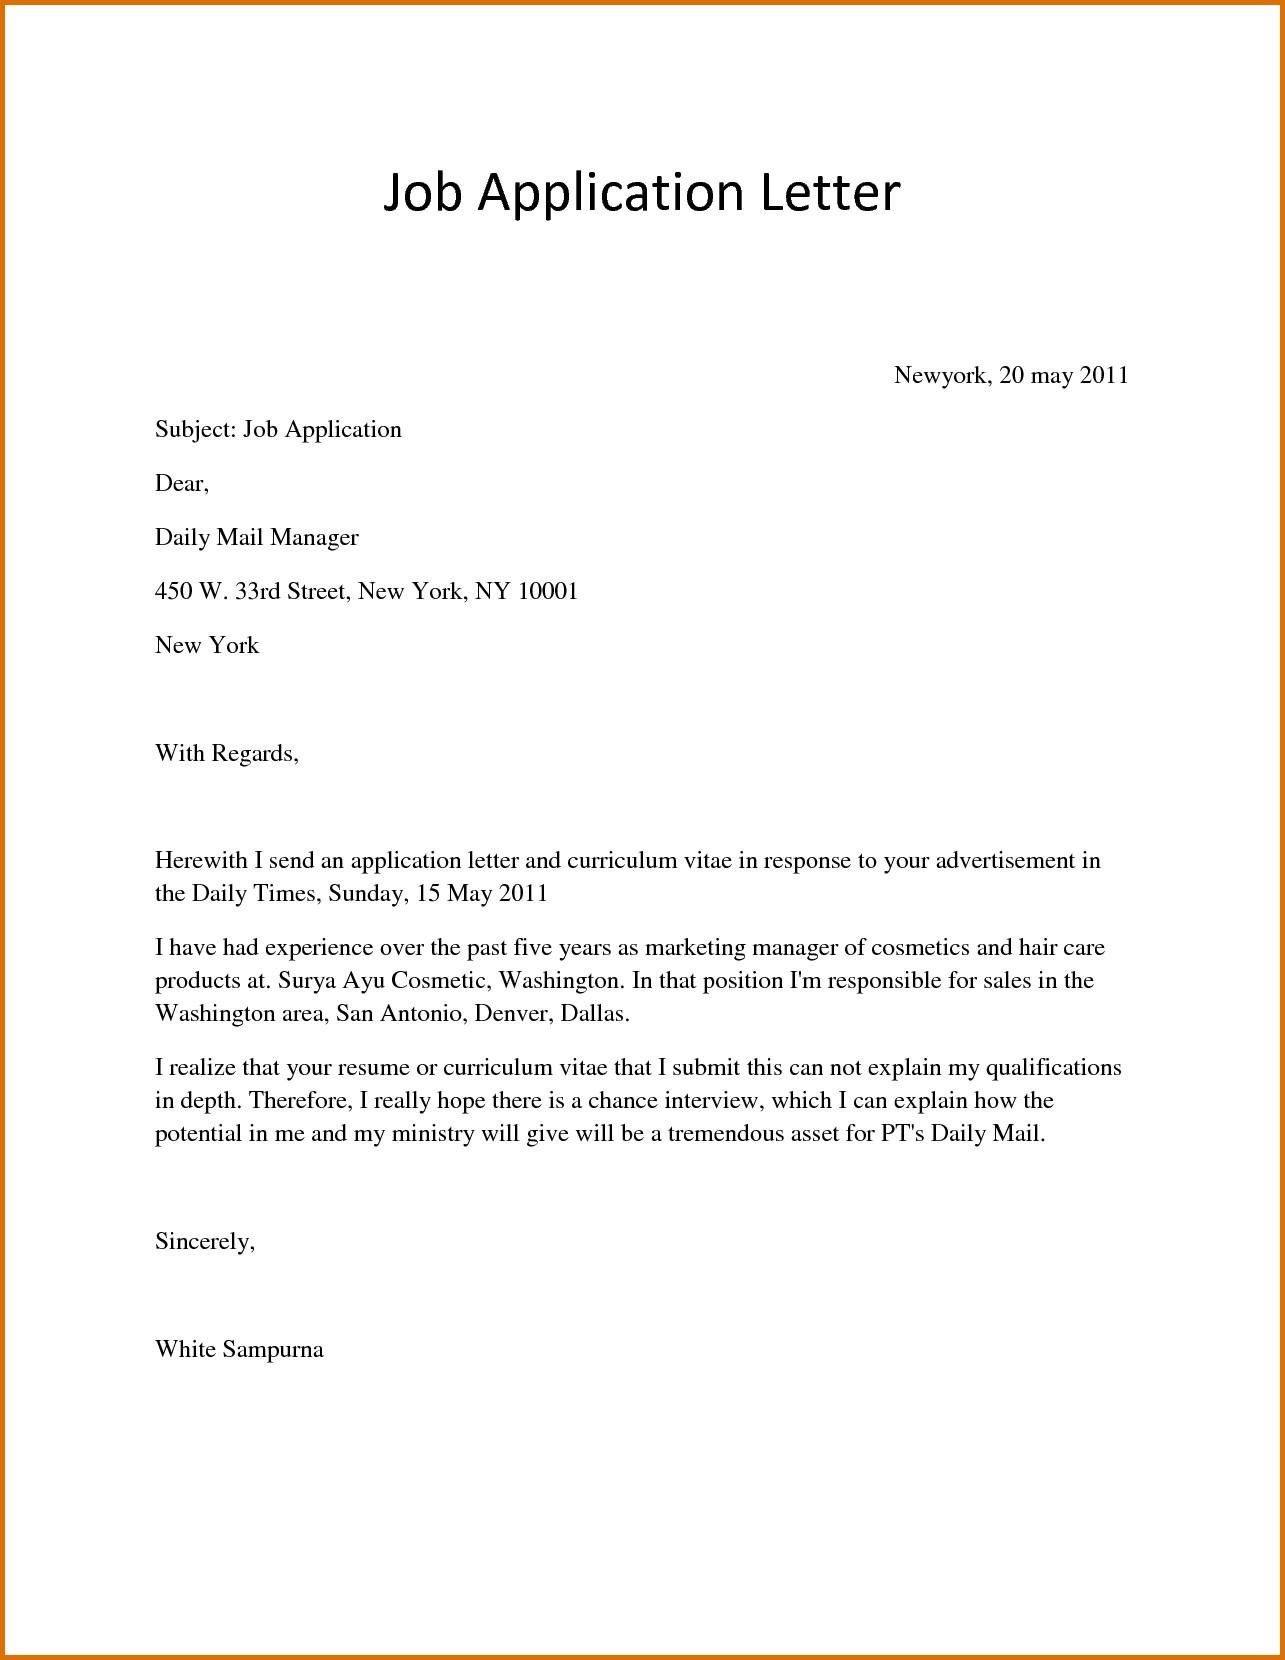 Vacancy Application Letter Sample on sample stay letter, sample sunshine letter, sample hostage letter, sample quarantine letter, sample disconnect letter, sample tenure letter,